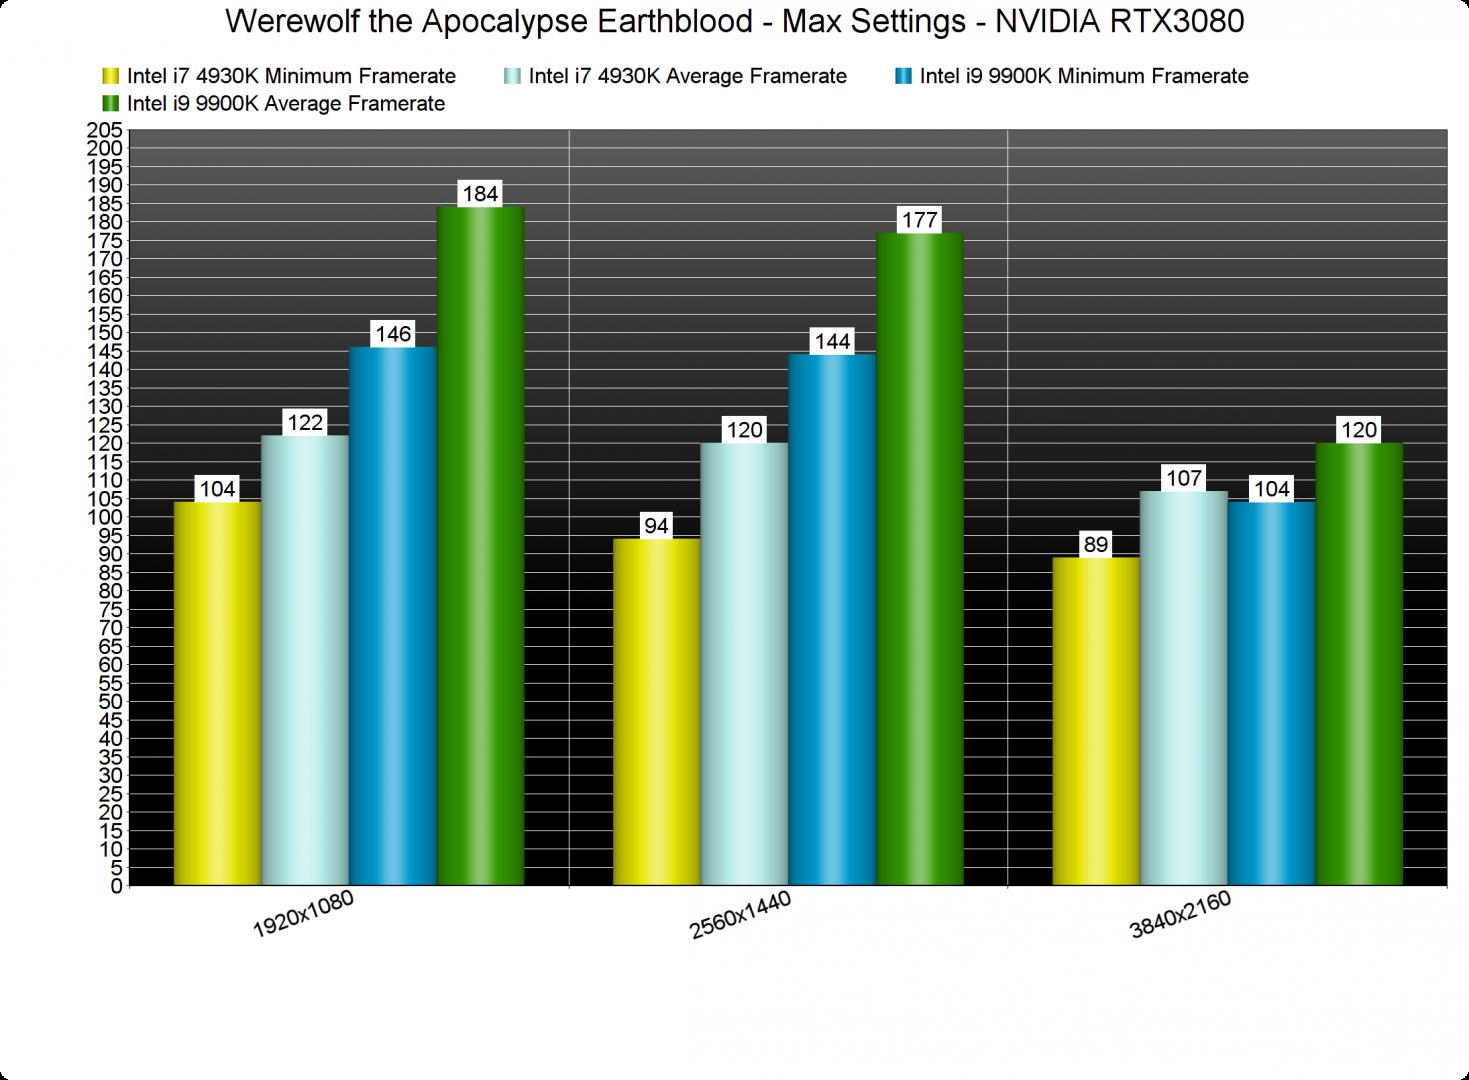 Werewolf the Apocalypse Earthblood CPU benchmarks-2